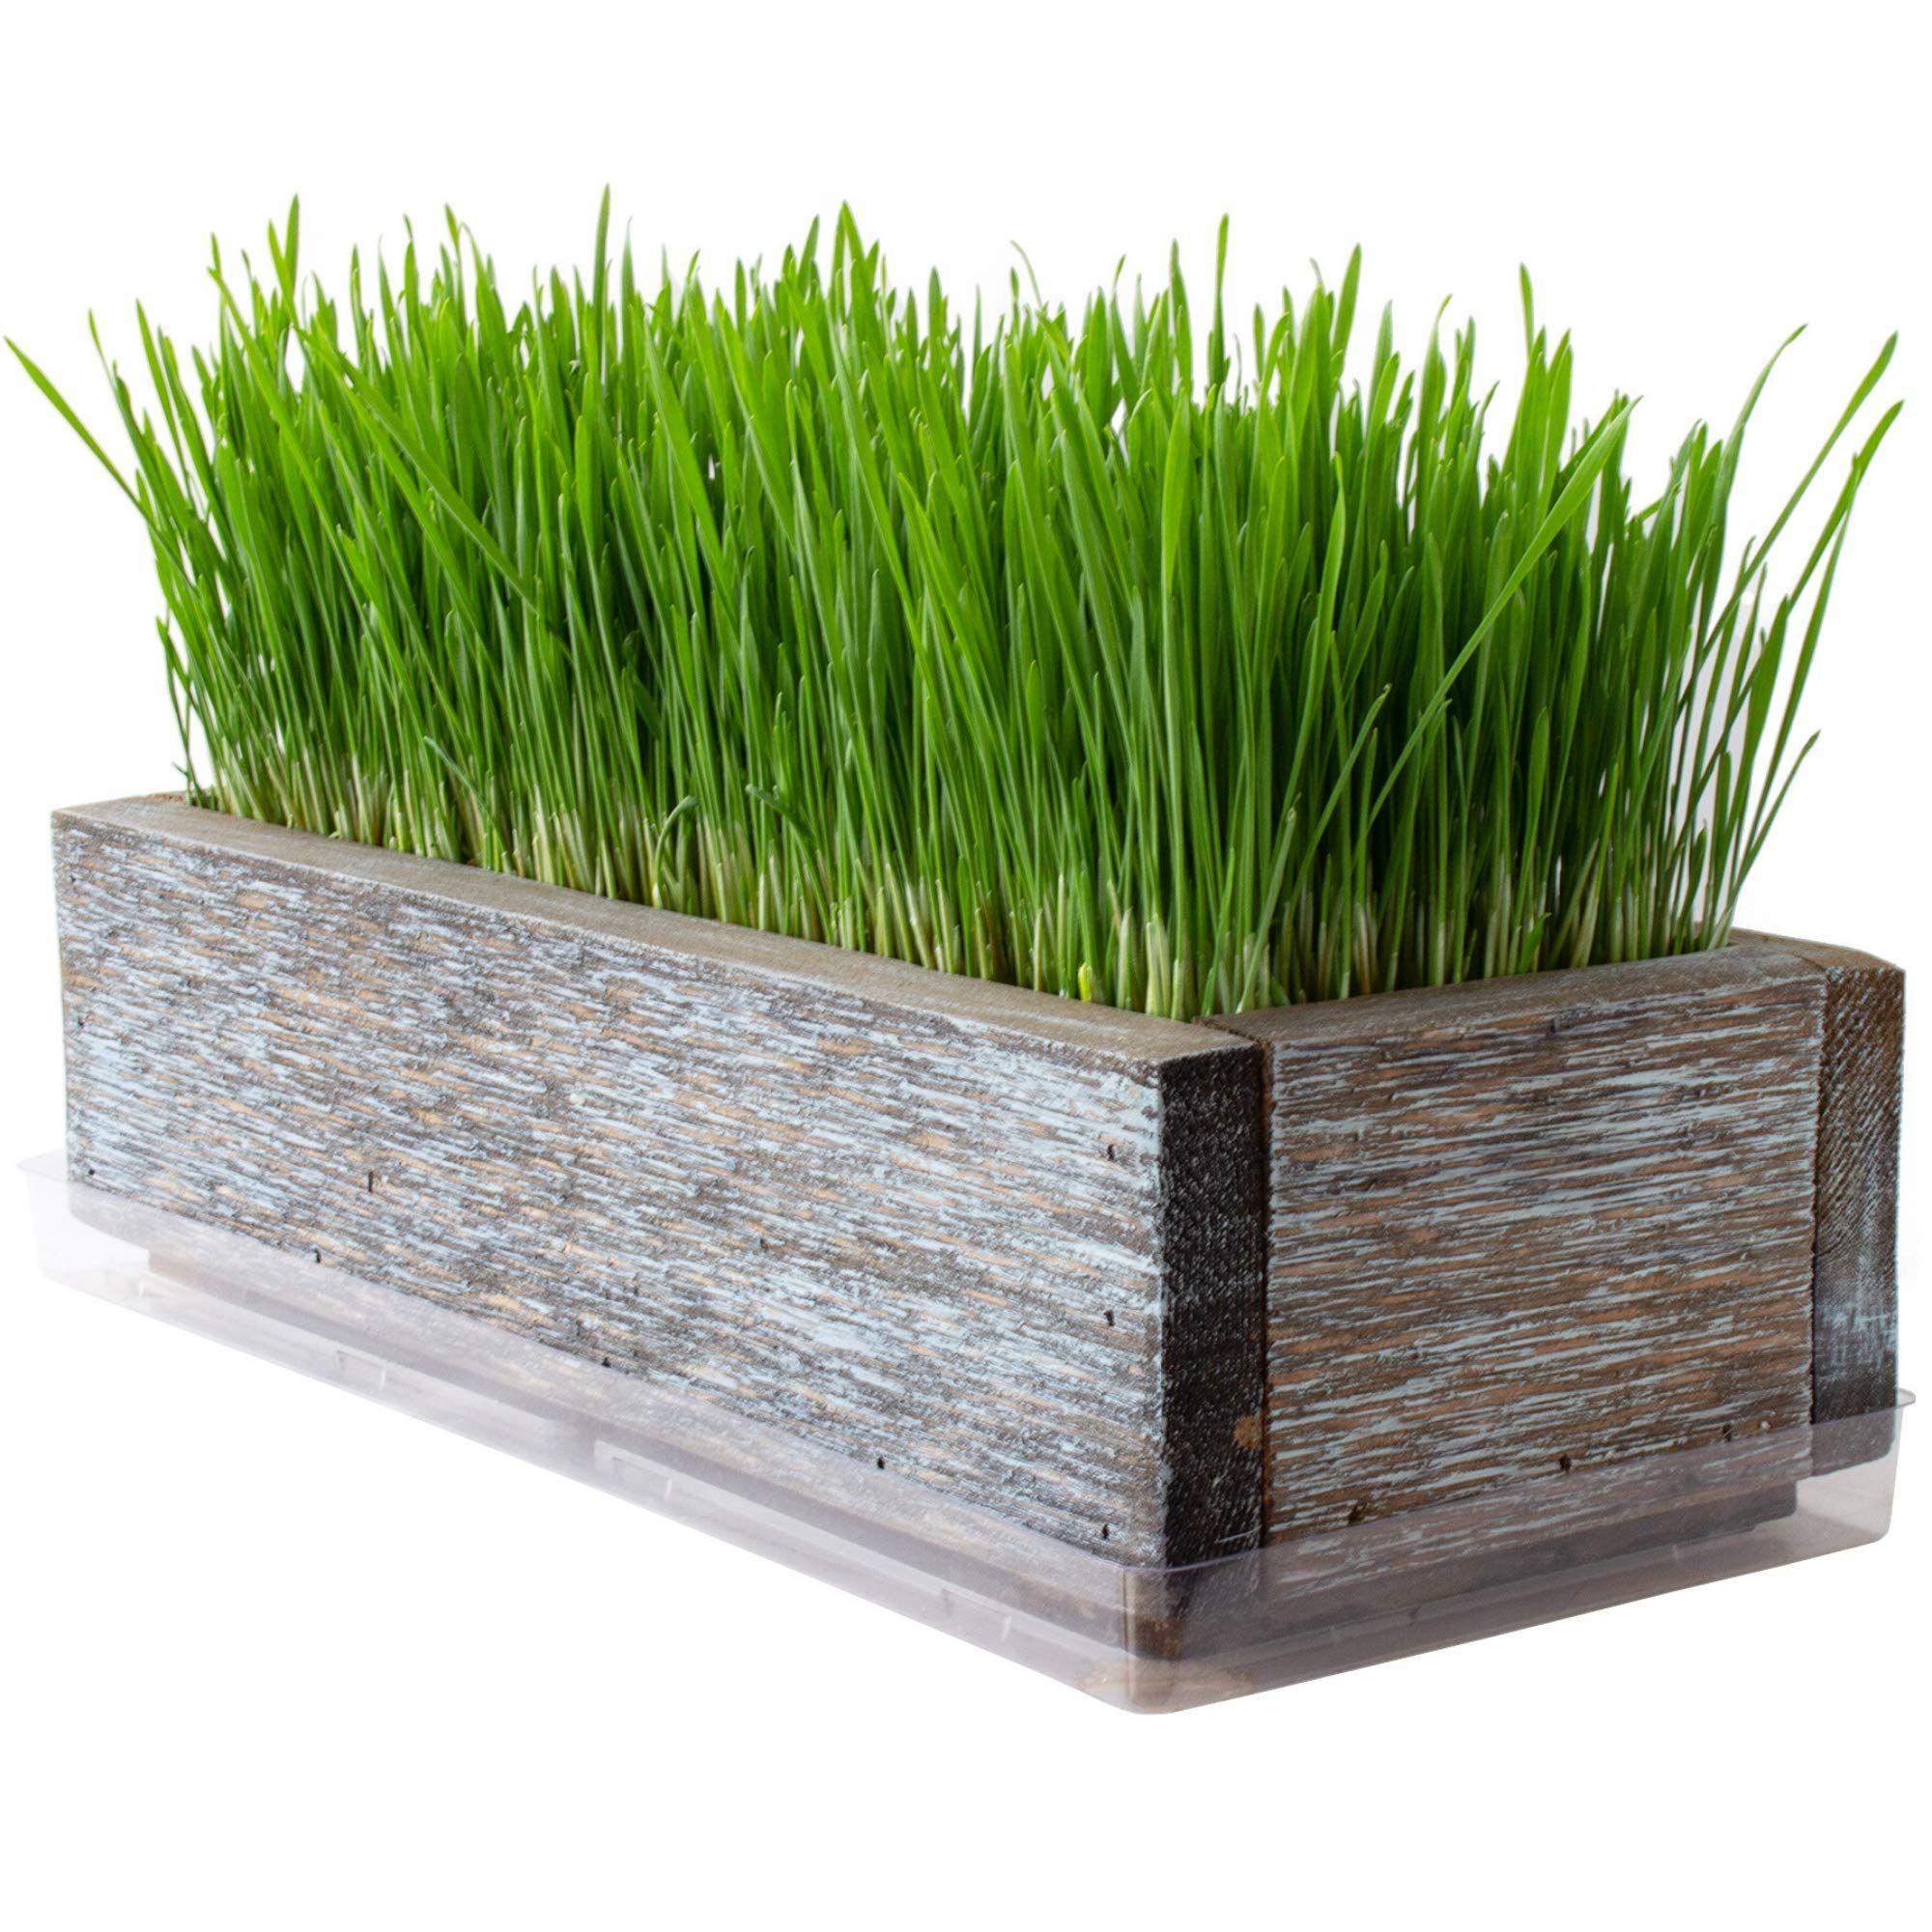 Reclaimed Barnwood Style Planter Wheatgrass Kit Aged